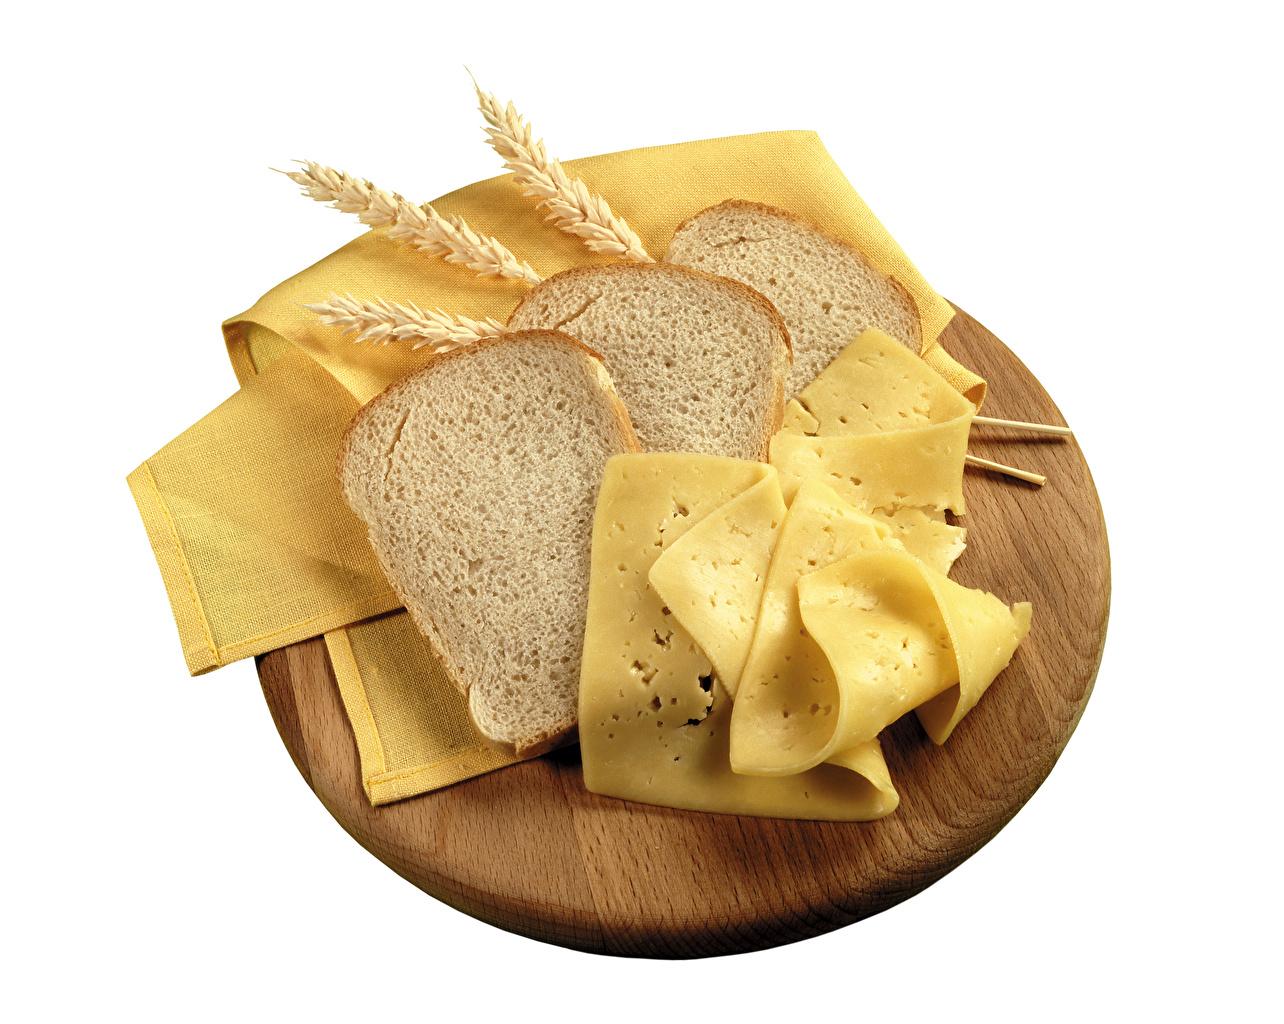 Картинки Хлеб Сыры Колос Продукты питания Белый фон Еда Пища